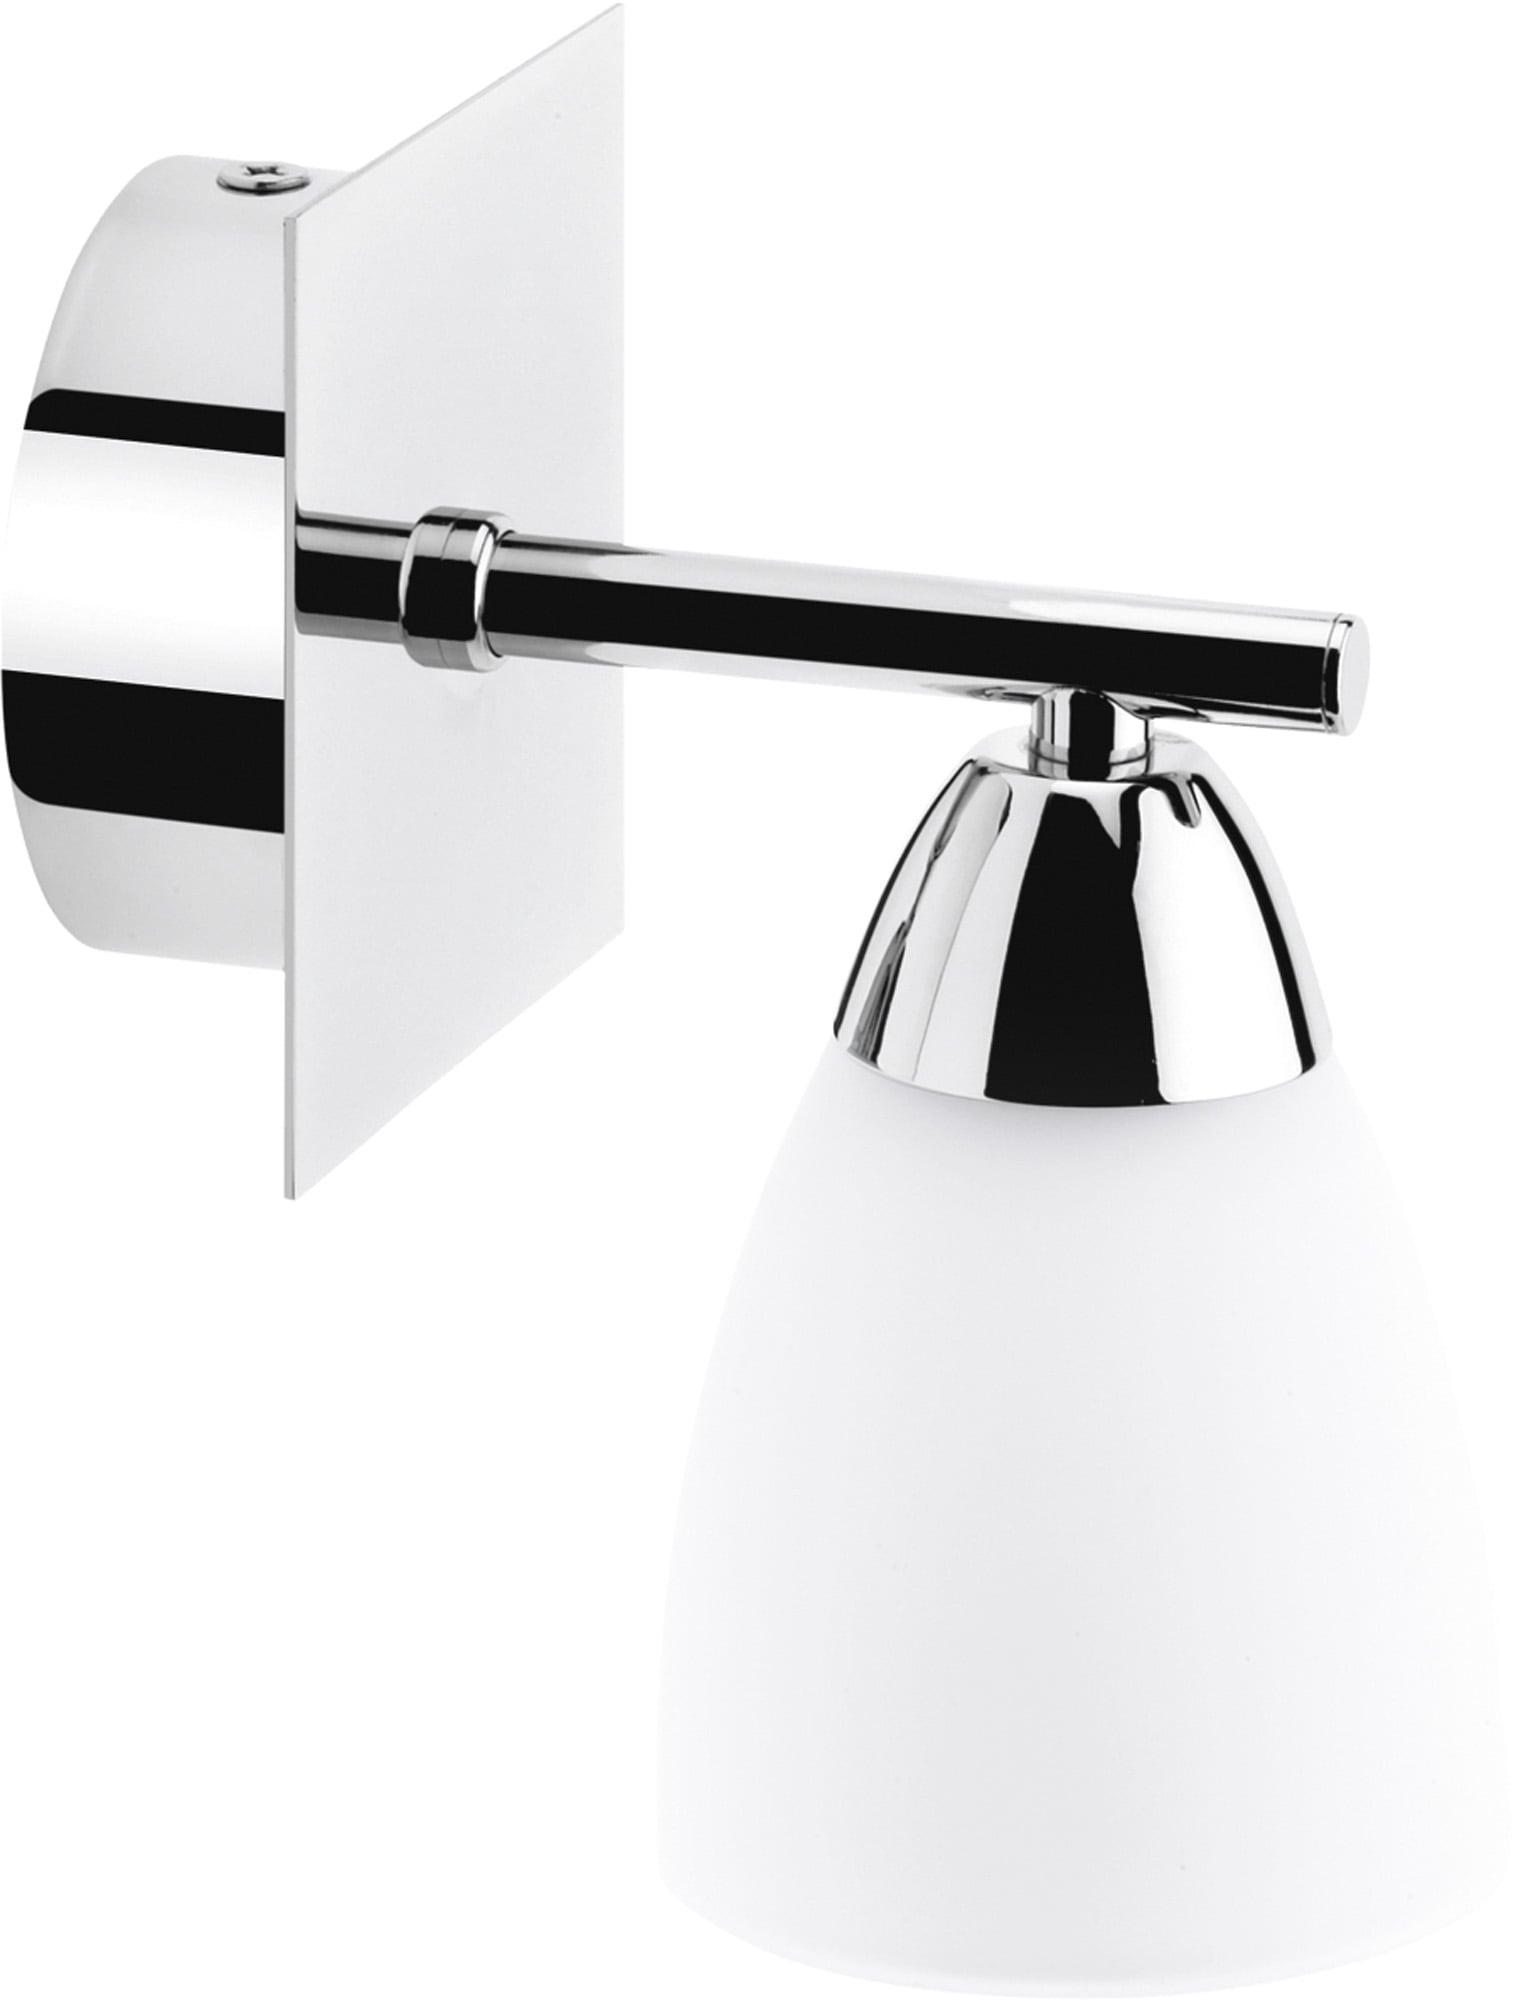 Wall lamp Aquatic chrome / white G9 40W